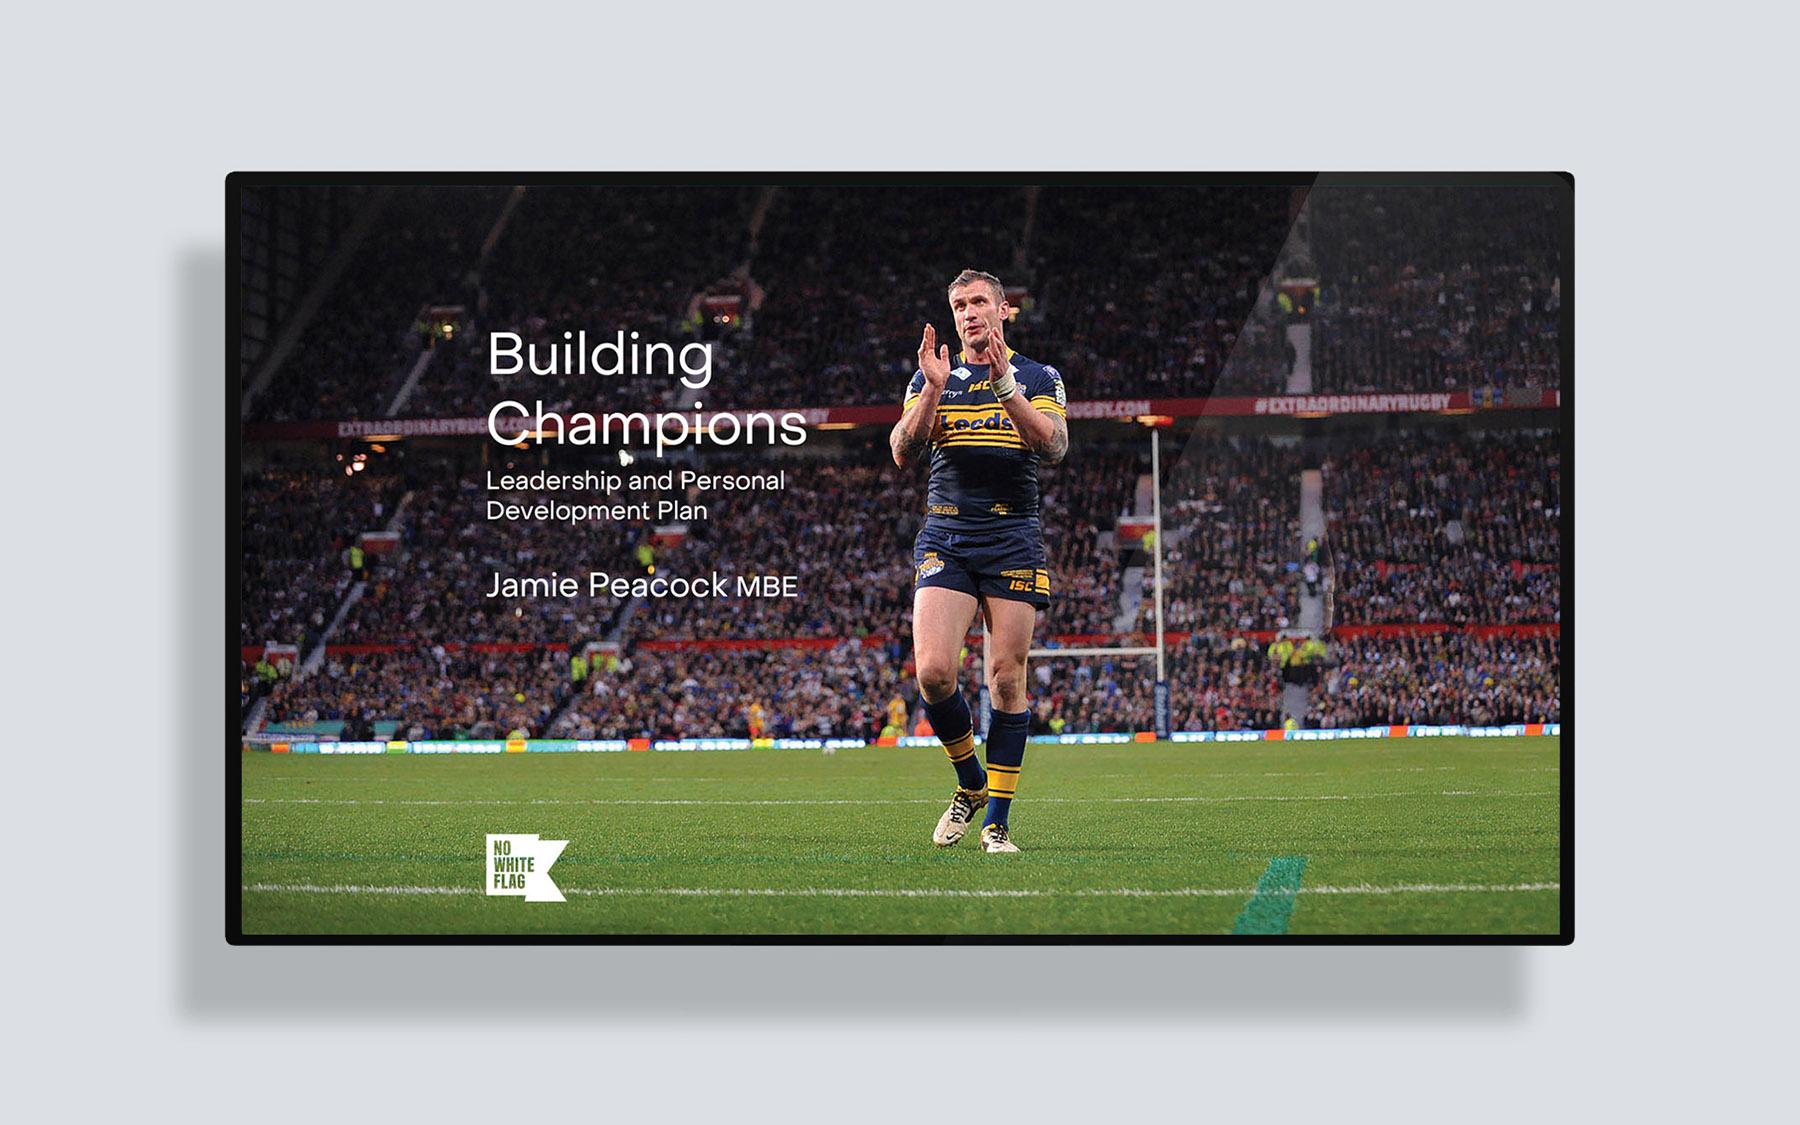 Jamie Peacock Leadership Training Manual presentation design by Leeds based Freelance Designer Neil Holroyd